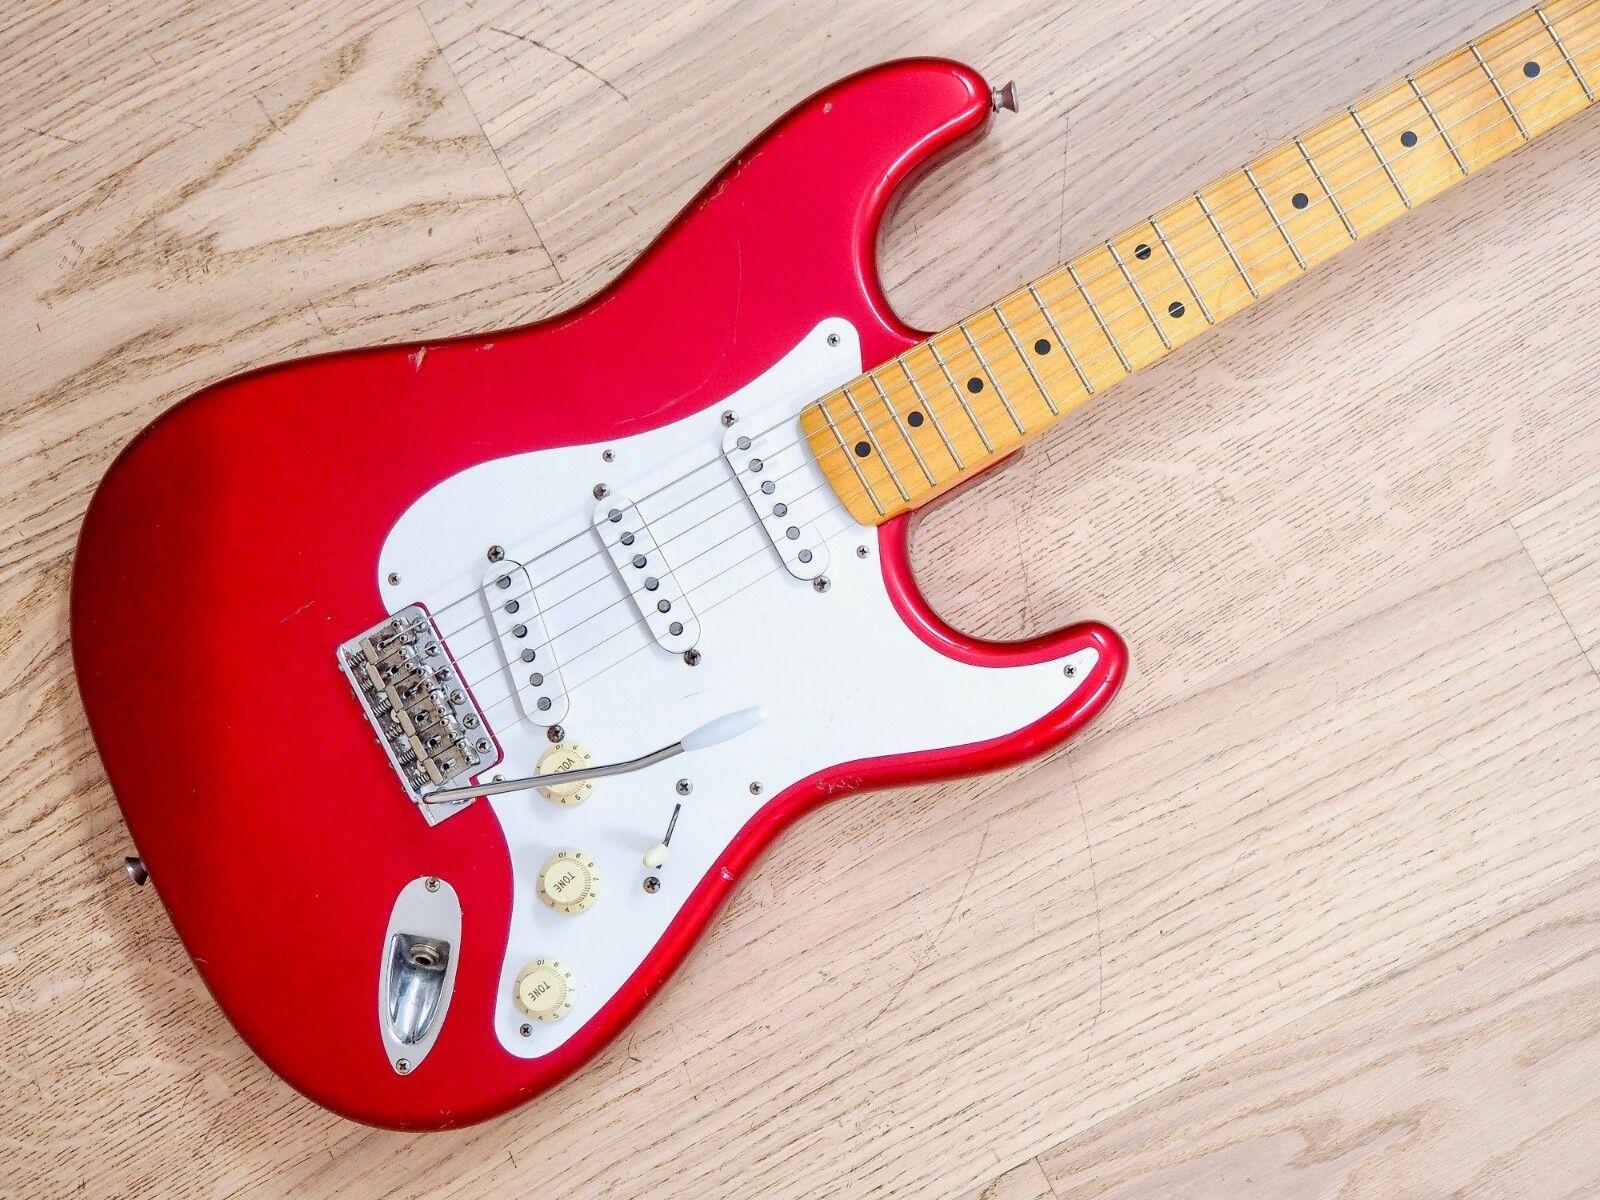 1999 Fender Stratocaster '57 Vintage Reissue ST57-70TX Candy Apple rot CIJ Japan